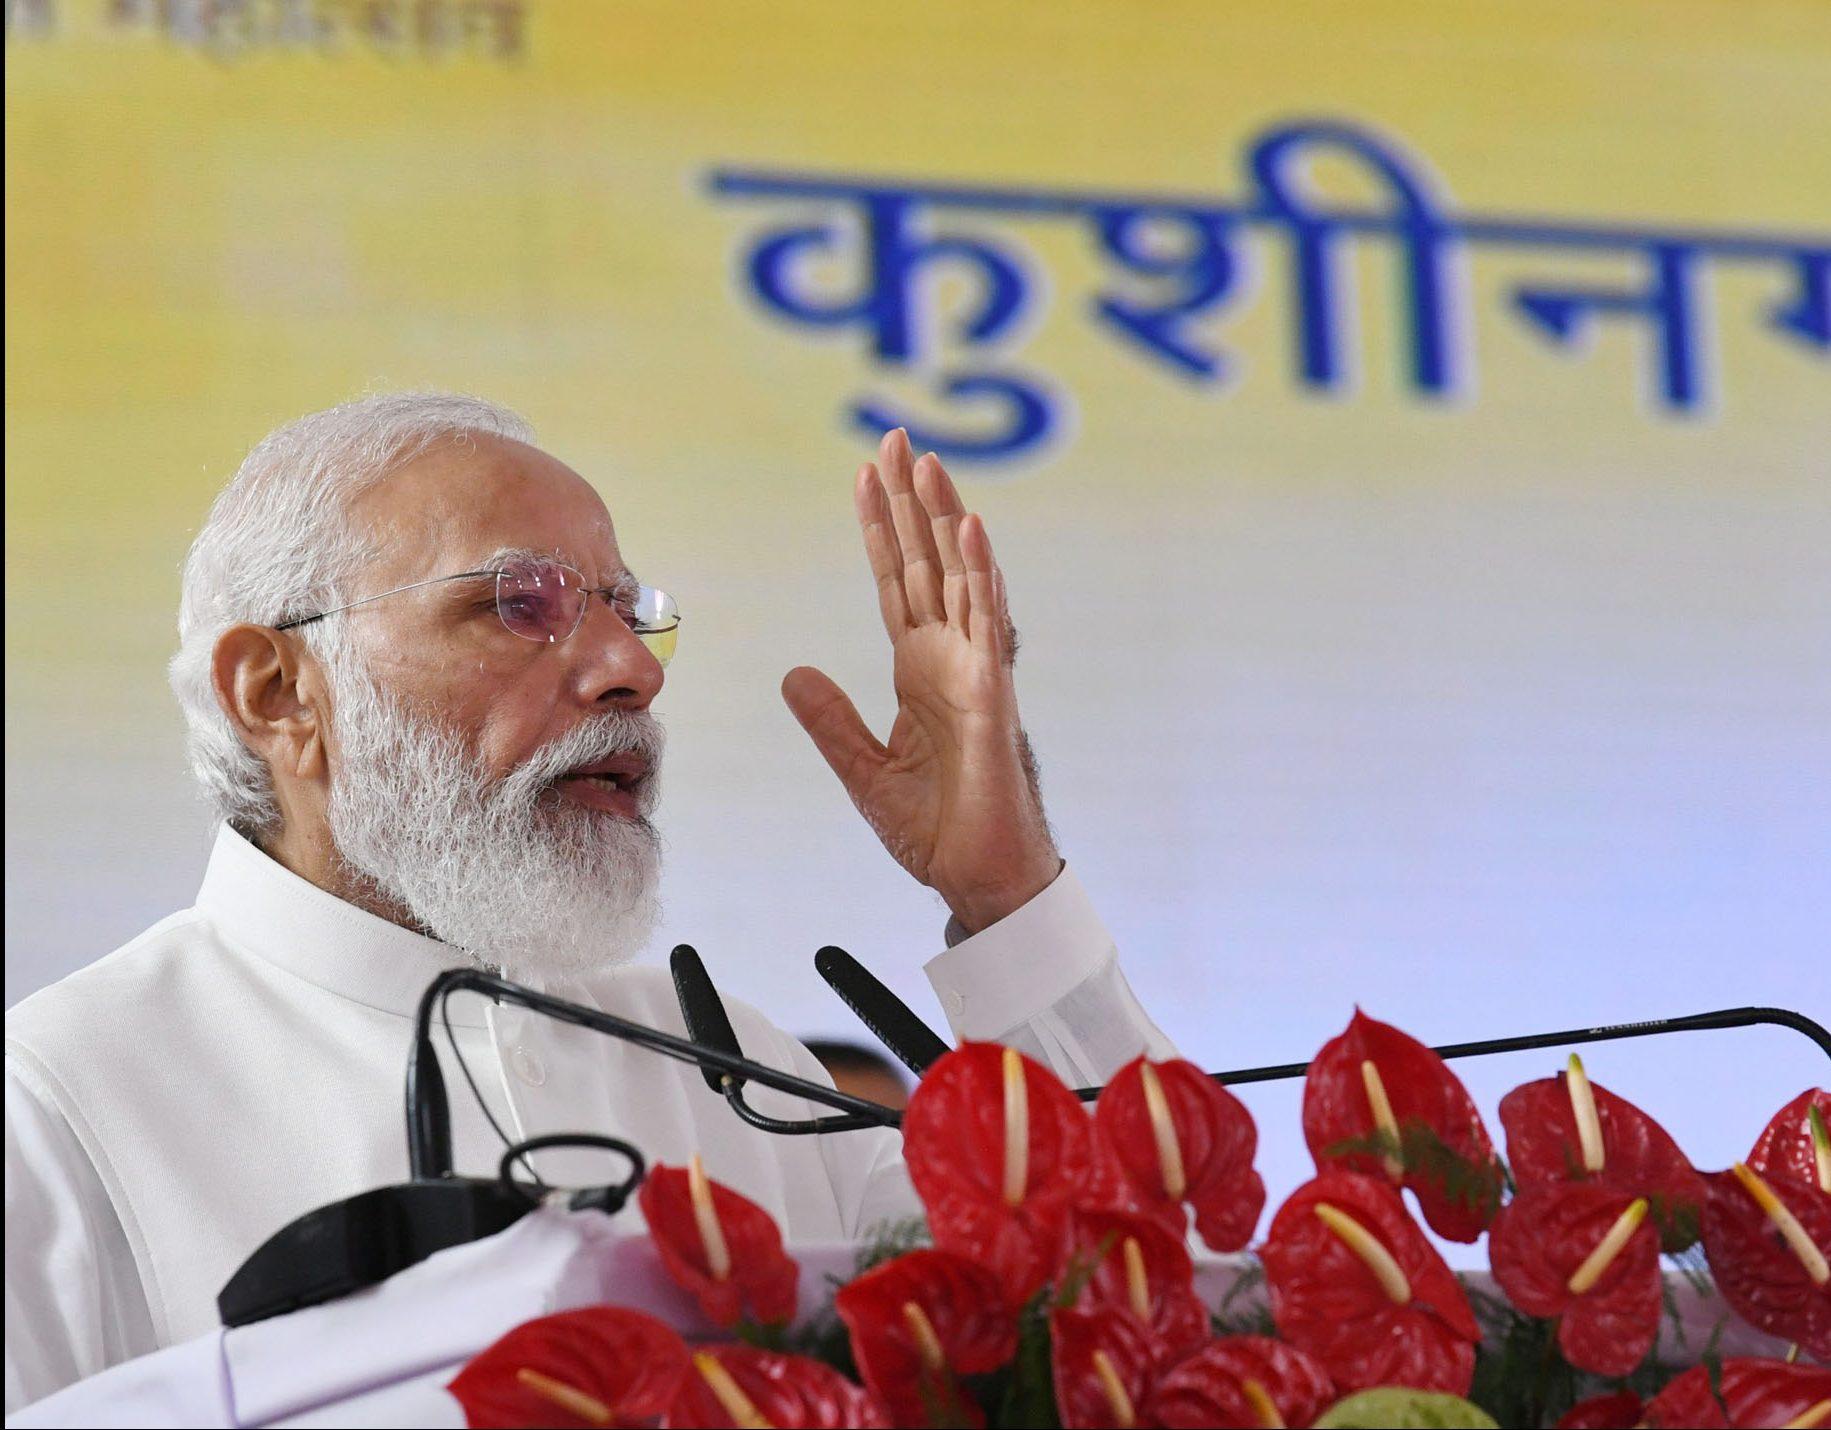 The Prime Minister, Shri Narendra Modi arrives at Kushinagar International Airport, Uttar Pradesh on October 20, 2021.  The Governor of Uttar Pradesh, Smt. Anandiben Patel and other dignitaries are also seen.